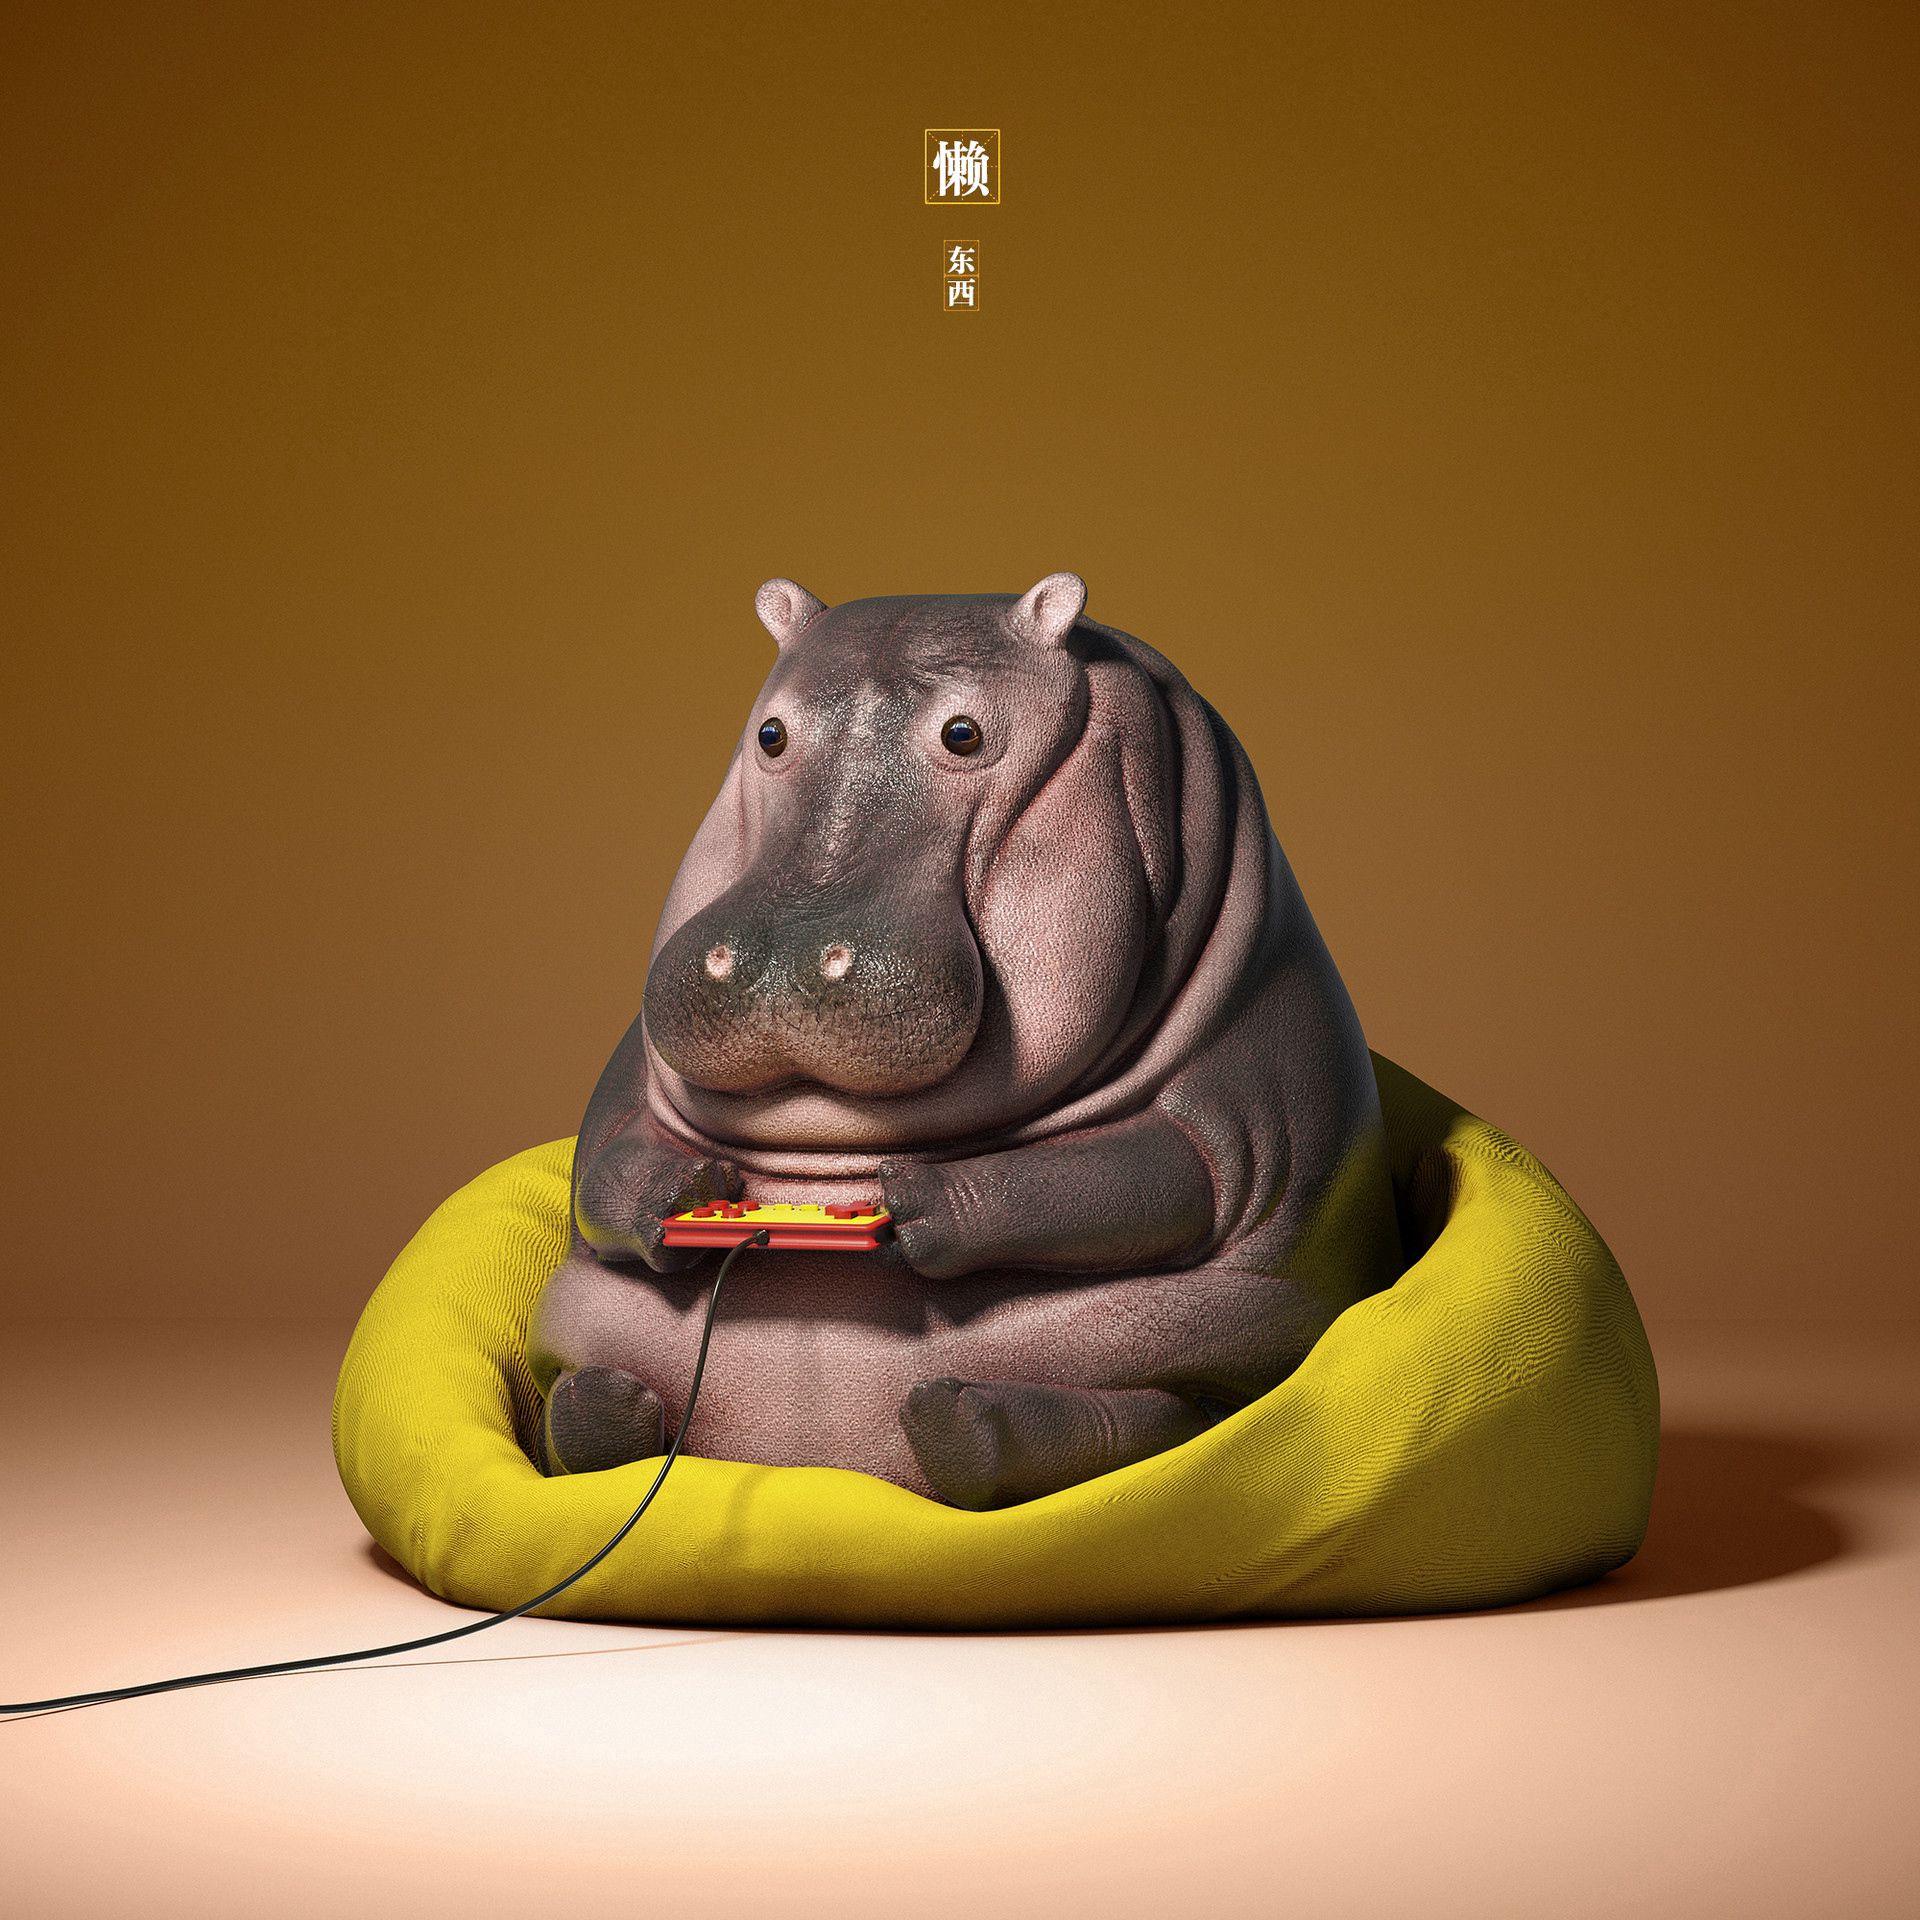 56301 download wallpaper Funny, 3D, Art, Hippopotamus, Joystick screensavers and pictures for free